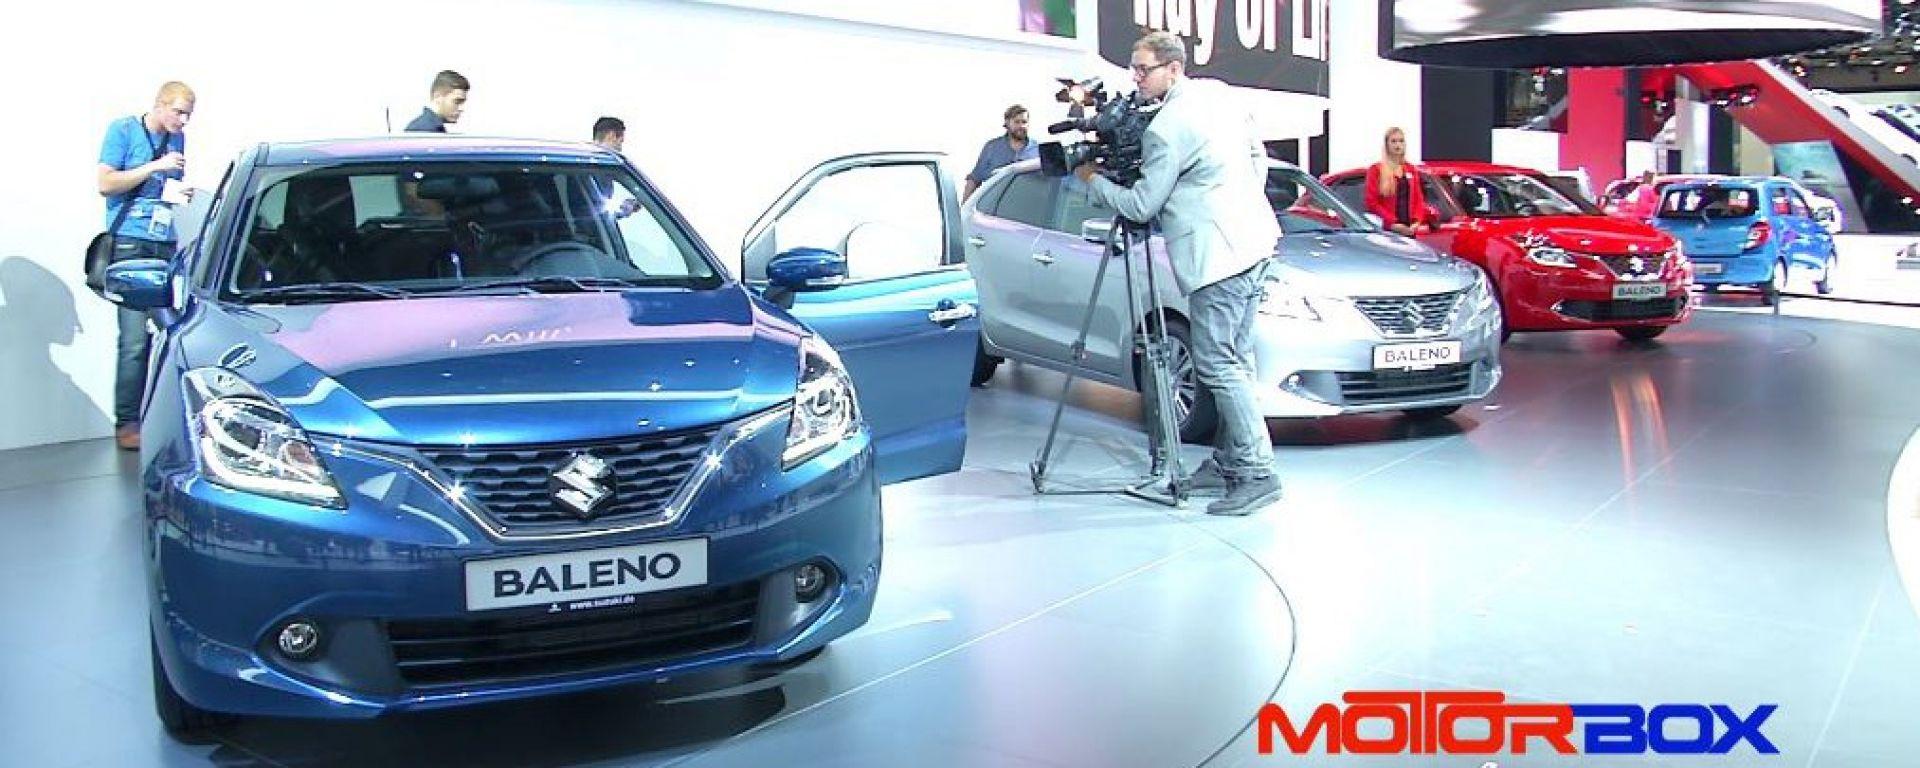 IAA Francoforte 2015: le novità Suzuki